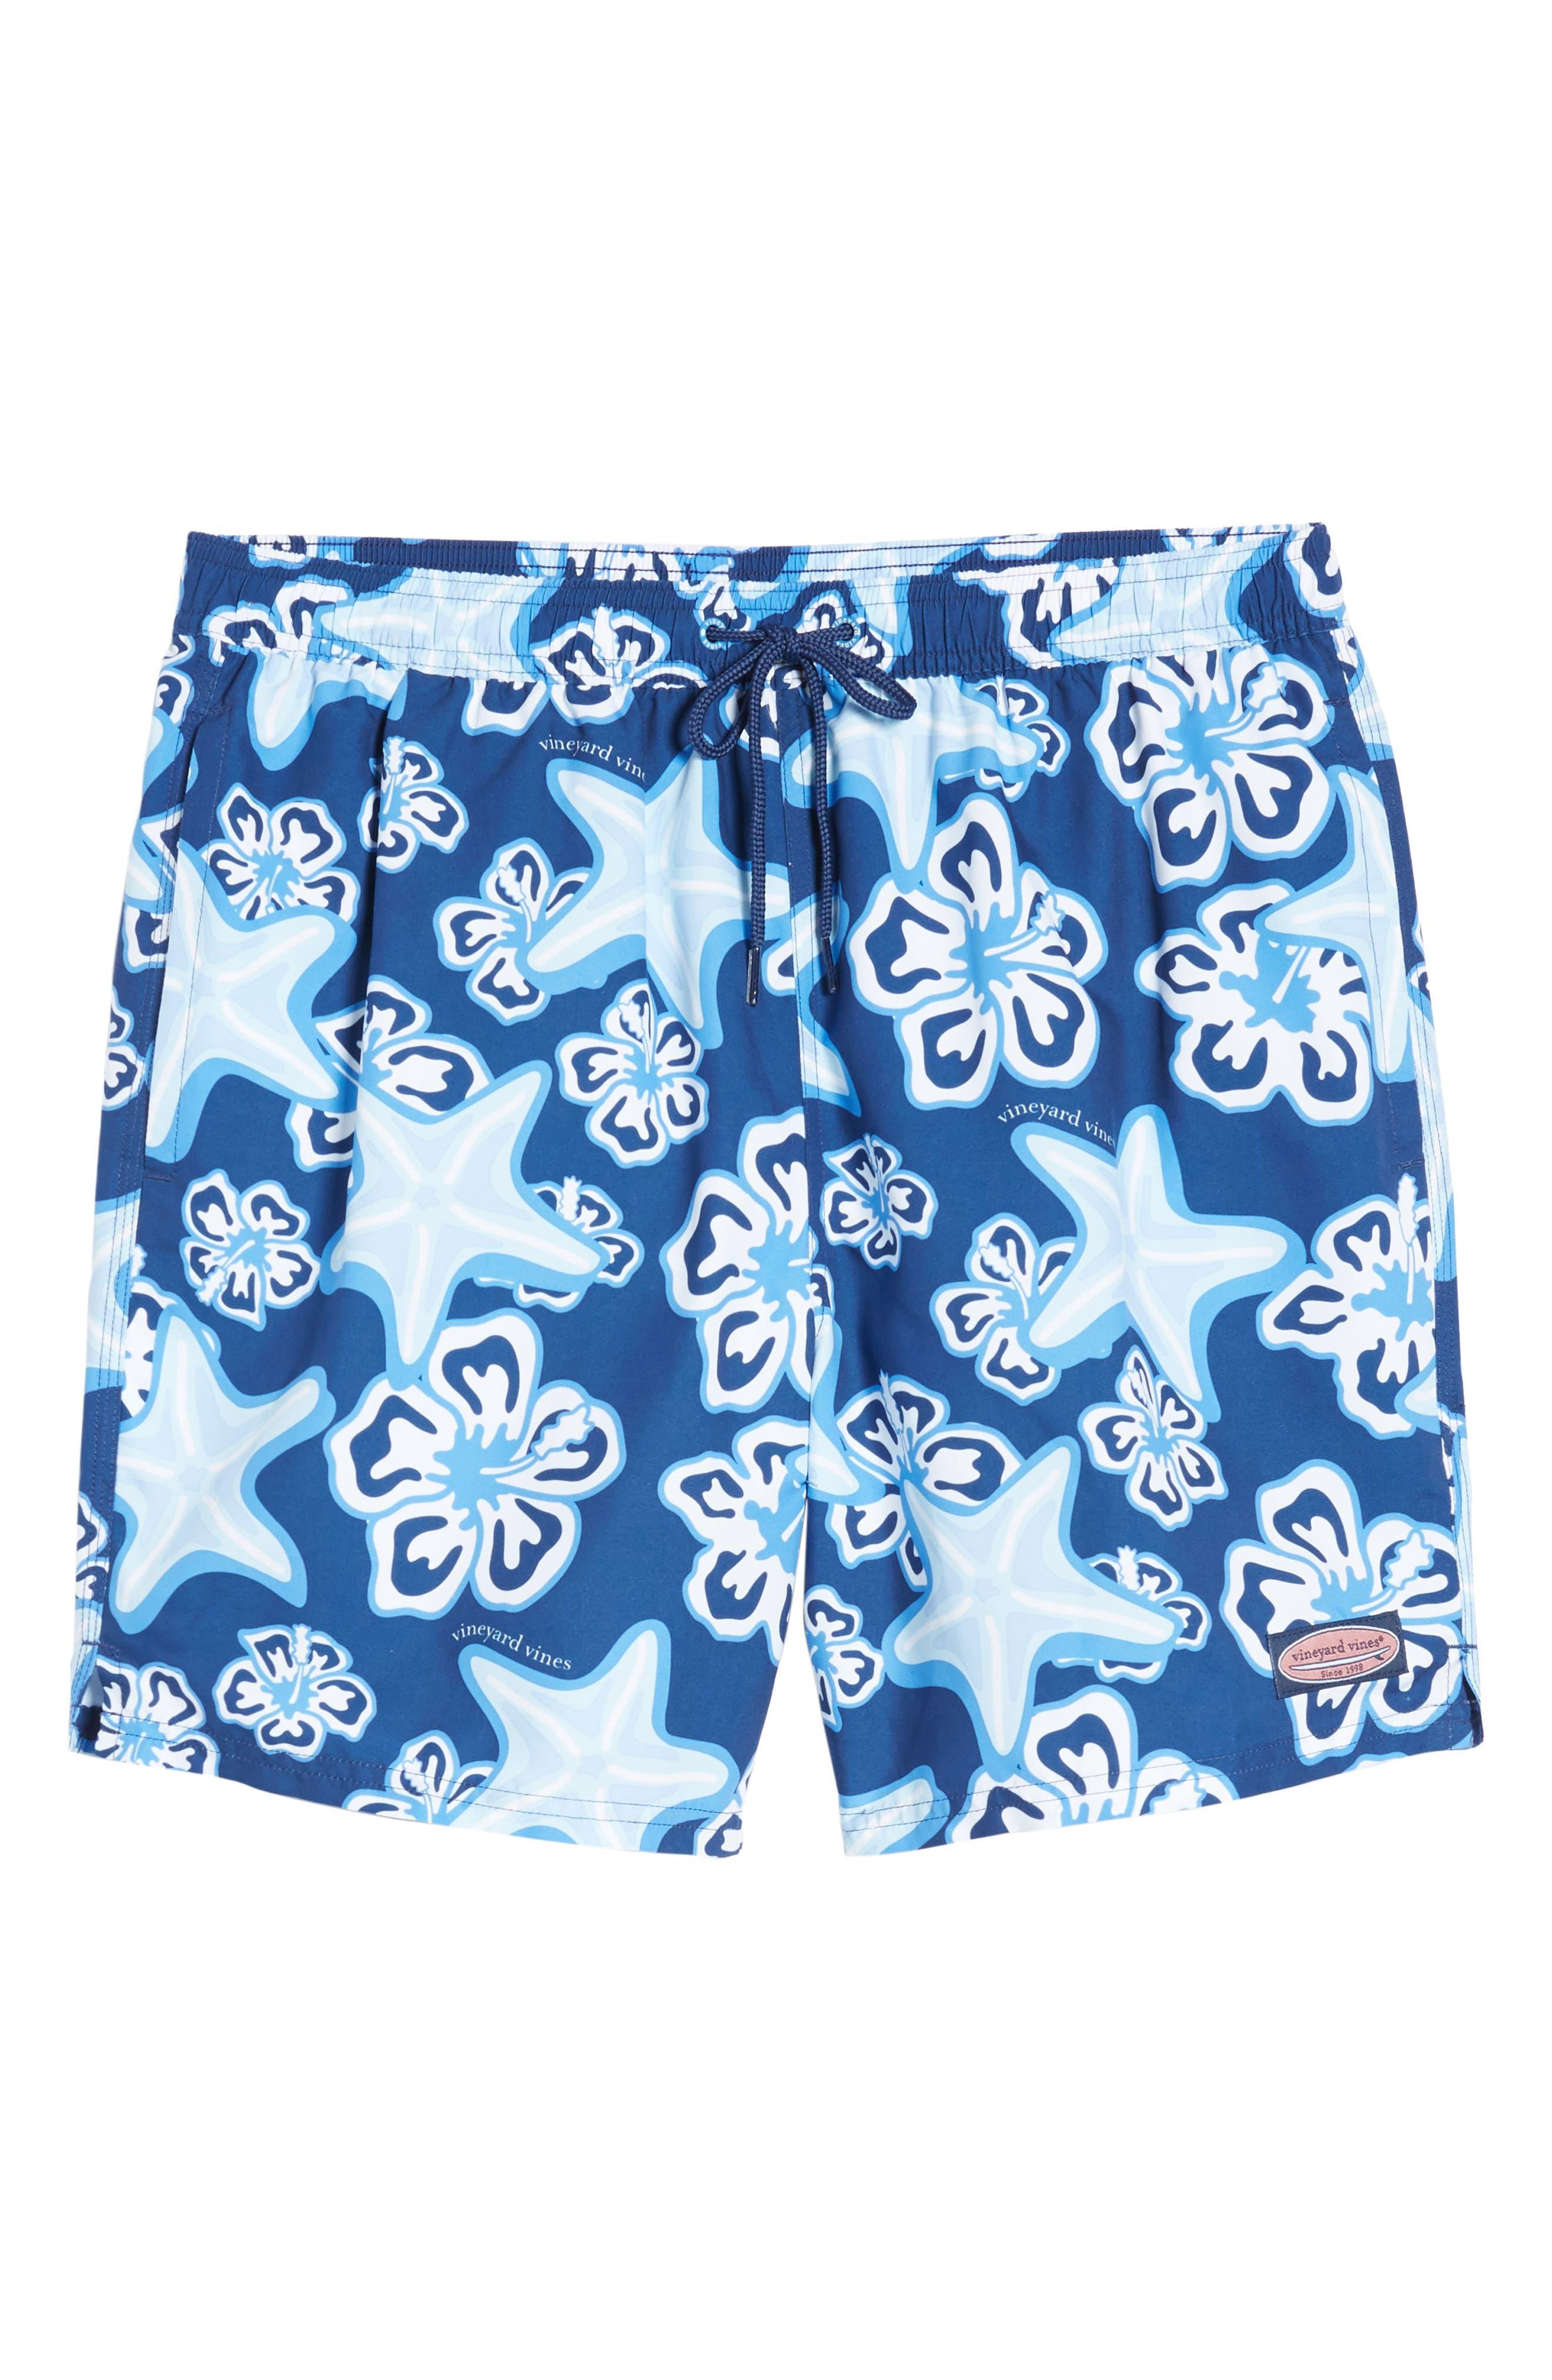 Chappy Starfish Swim Trunks,                             Alternate thumbnail 6, color,                             BLUE DEPTH